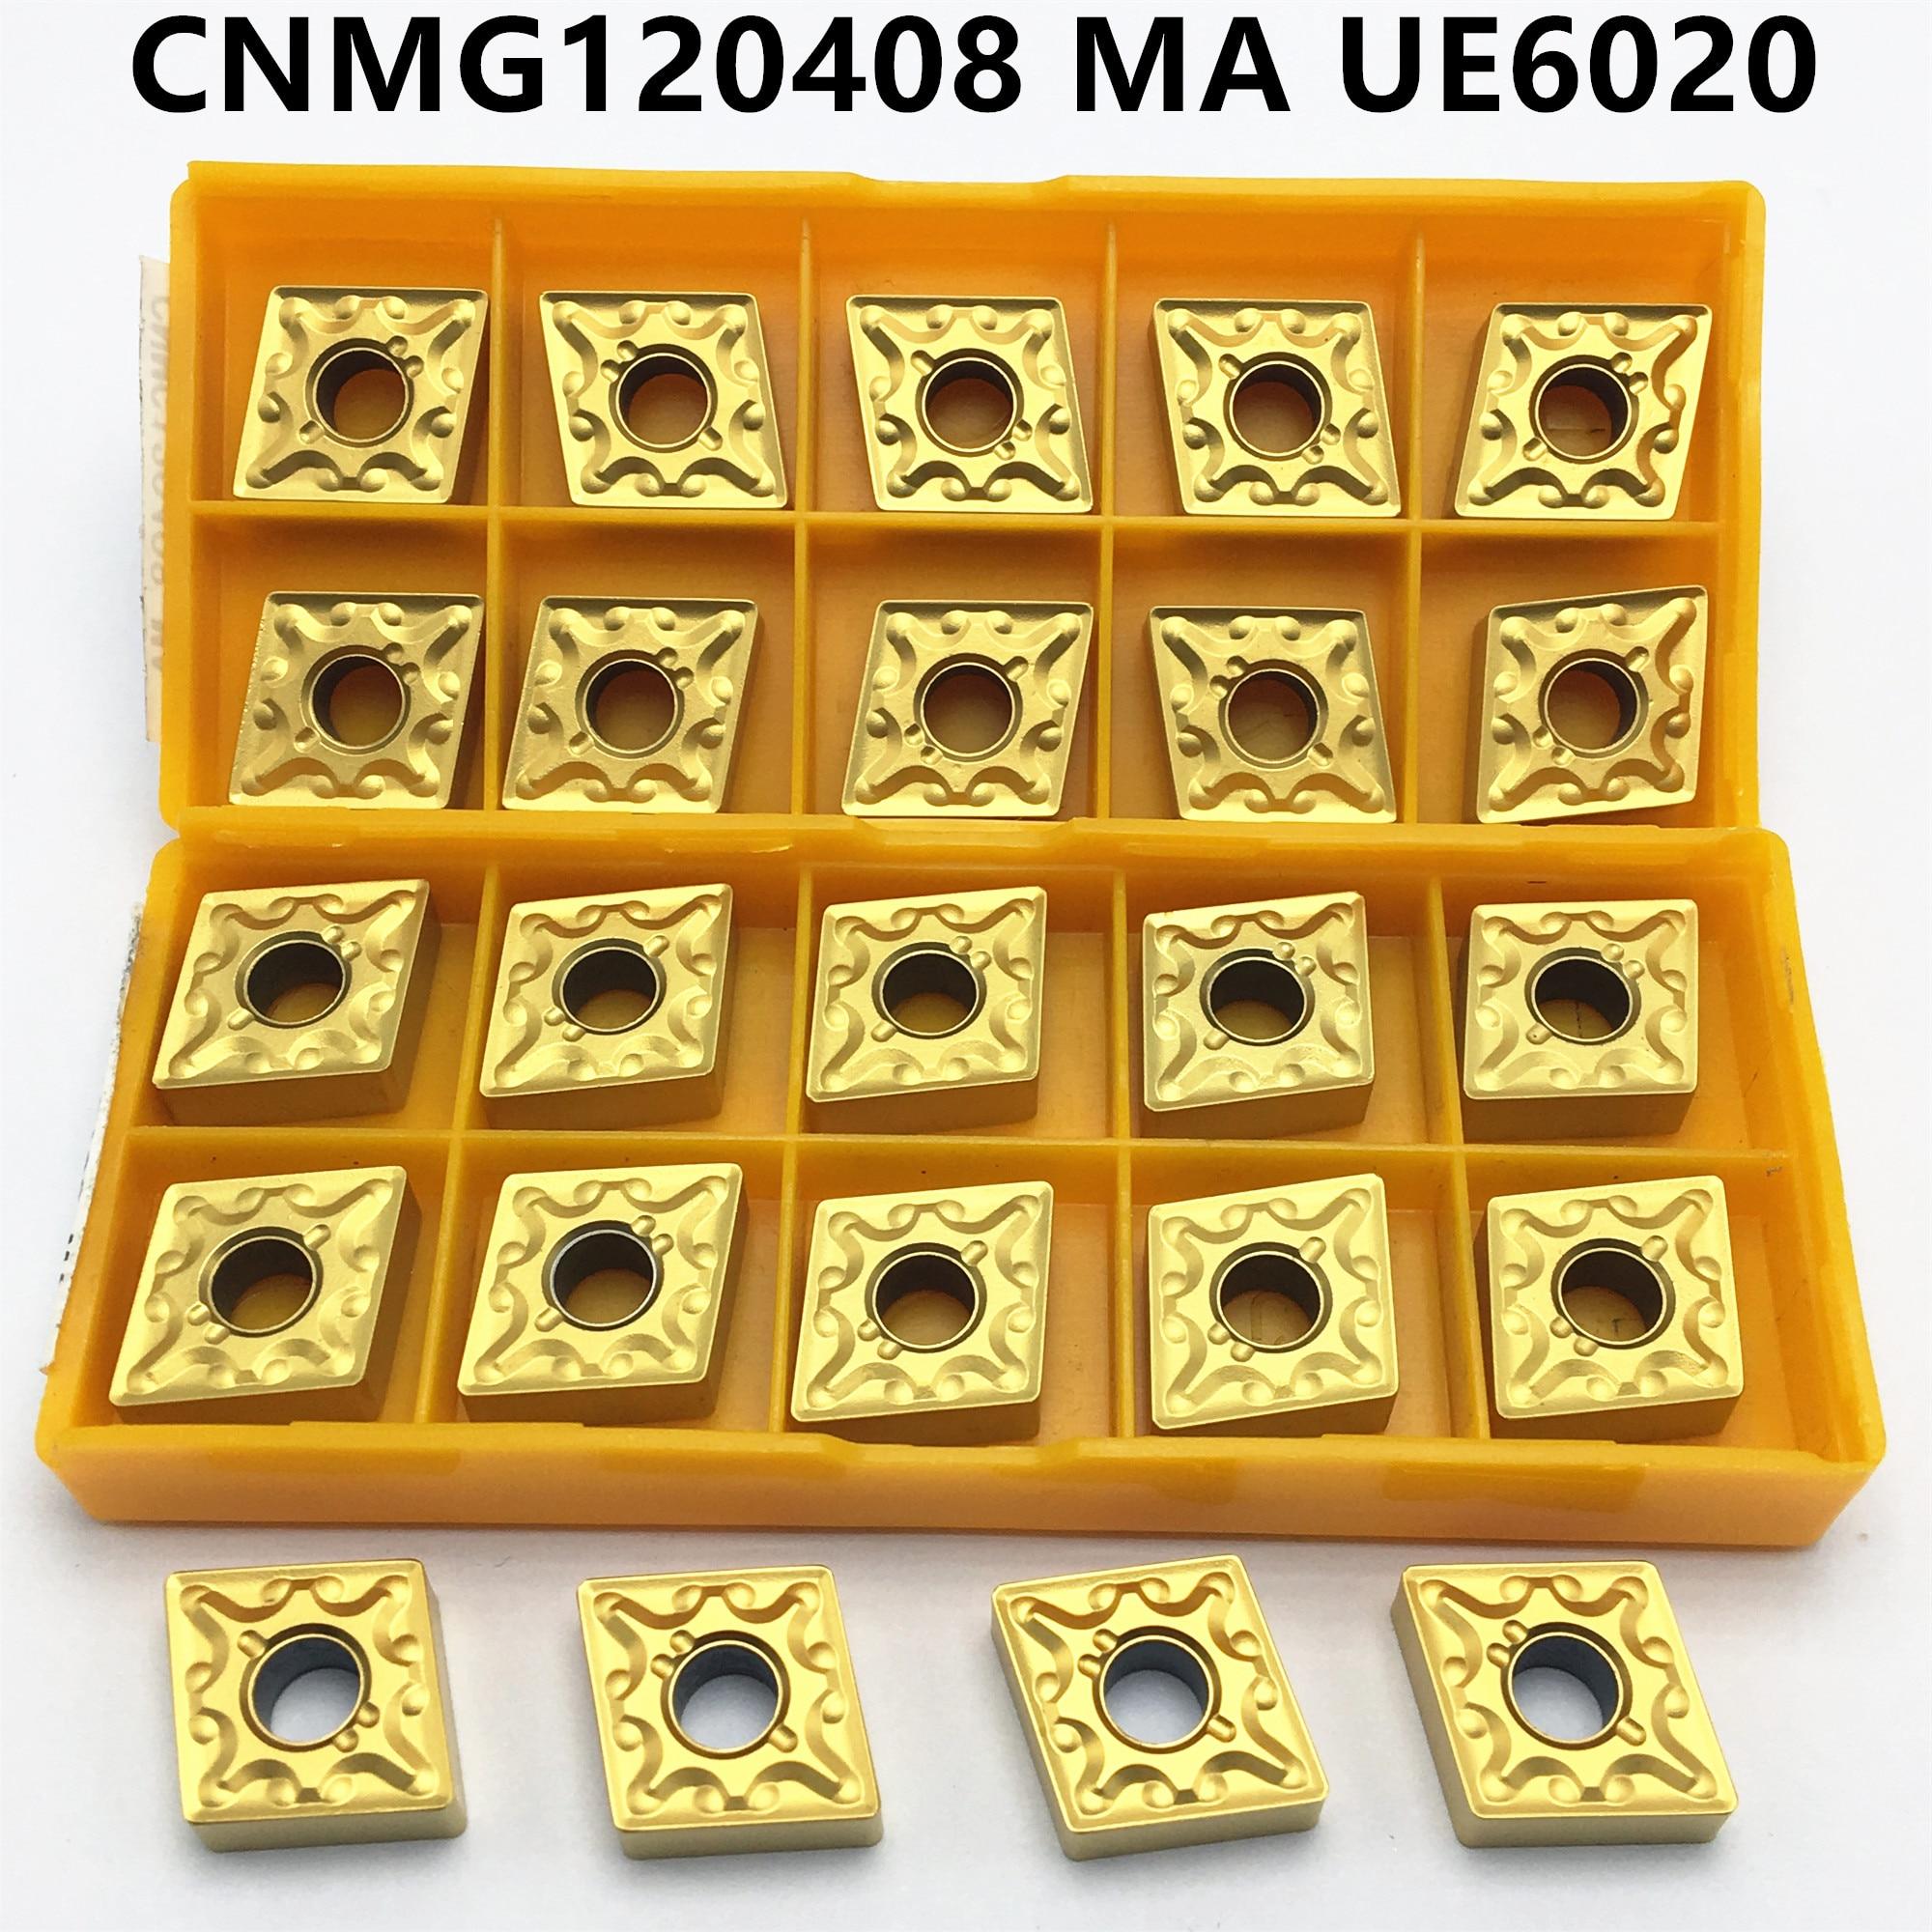 10pcs CNMG120408-MA CNMG432-MA UE6020 Carbird Inserts CNC blade